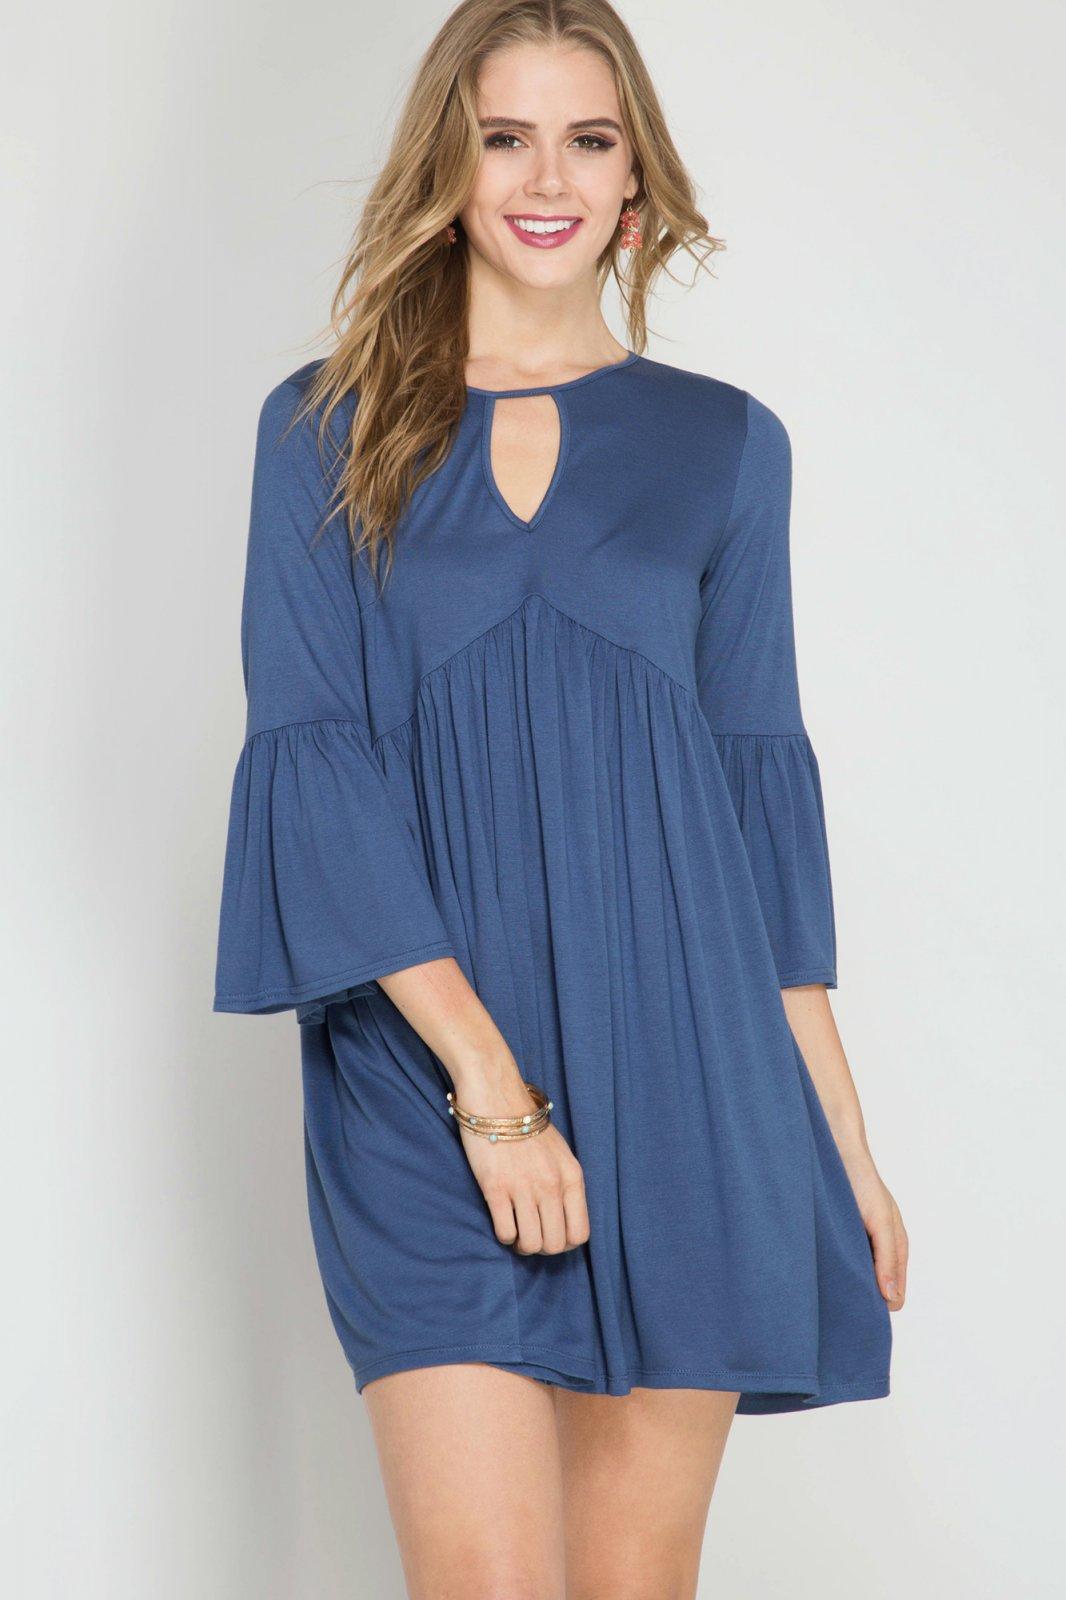 DRESS or TUNIC - 3/4 Bell Sleeve DEEP BLUE * RAYON